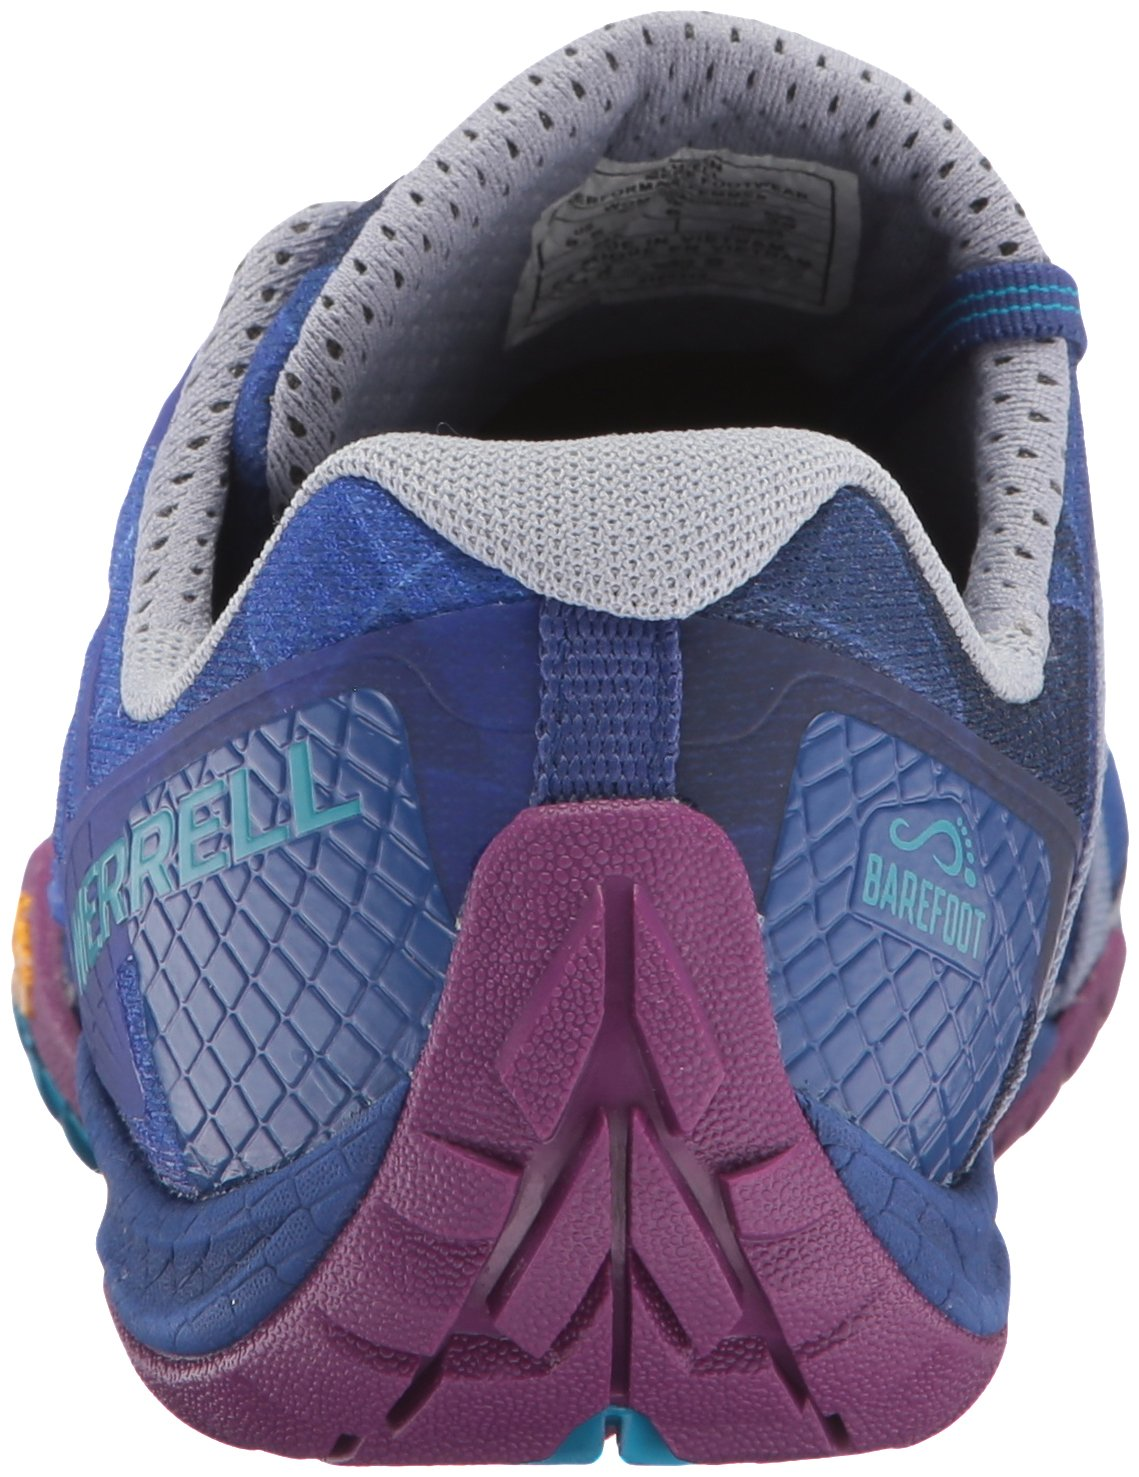 Merrell Women's Glove 4 Trail US|Aleutian Runner B01NAUUX5U 10 B(M) US|Aleutian Trail 230142